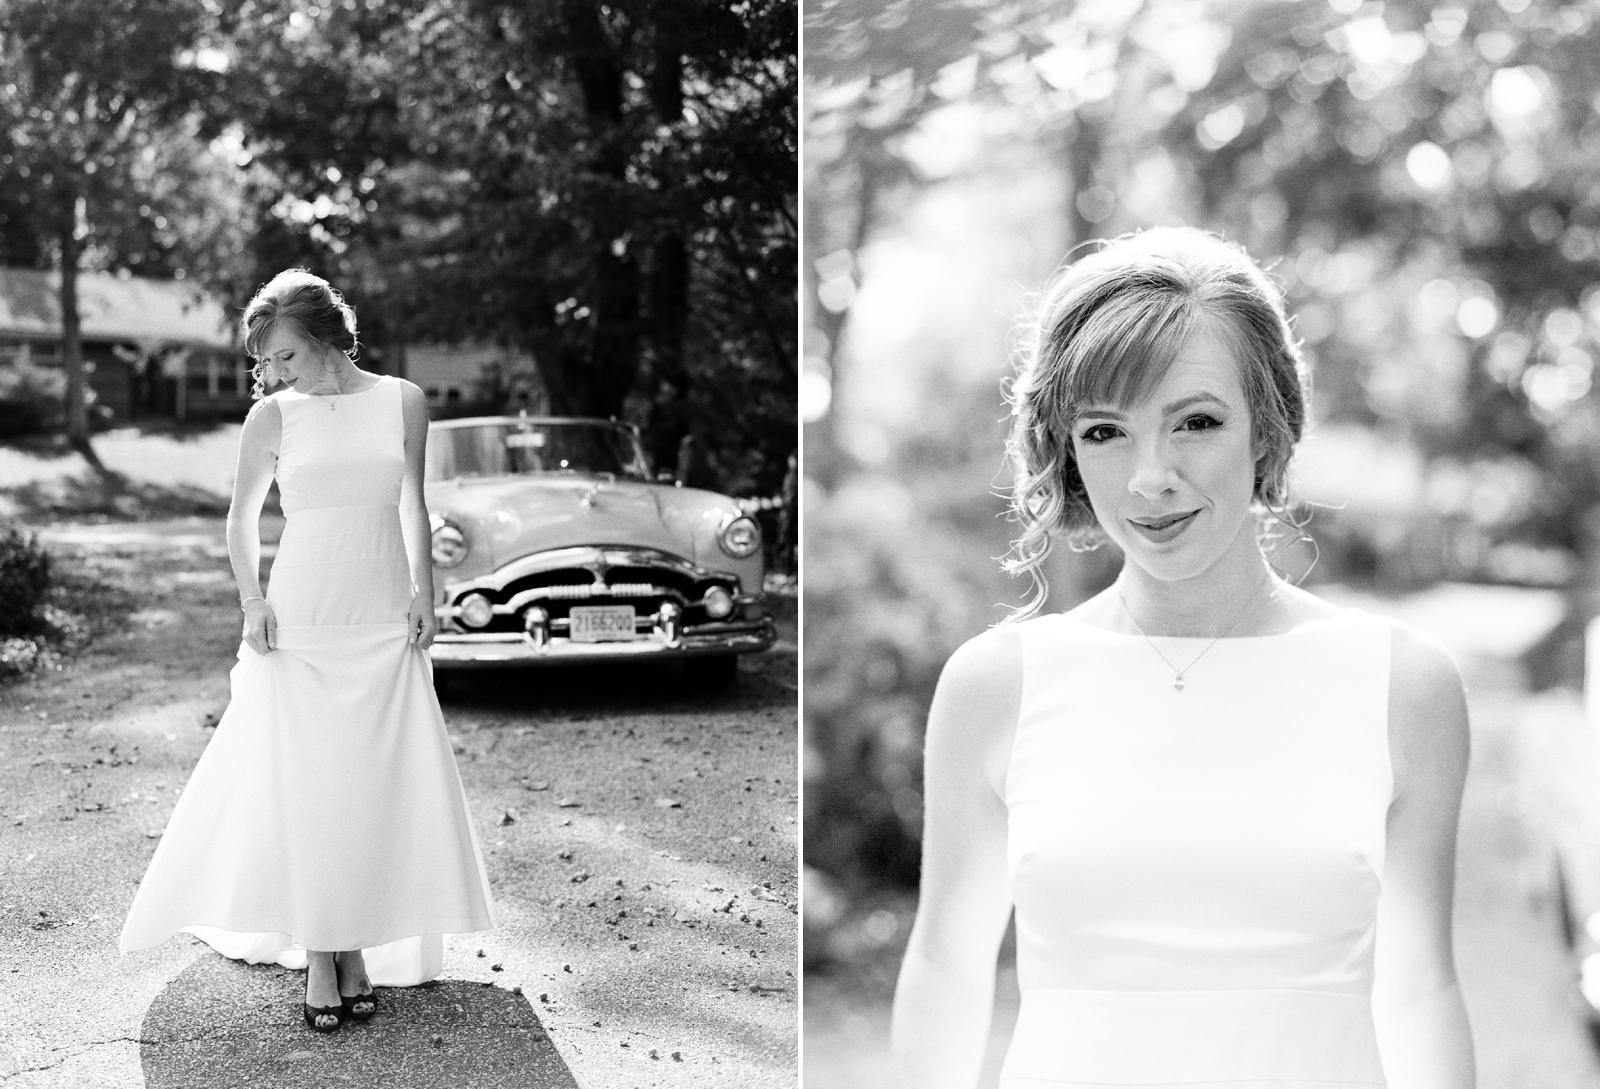 ringwood new jersey wedding photographer shannon griffin_0001.jpg